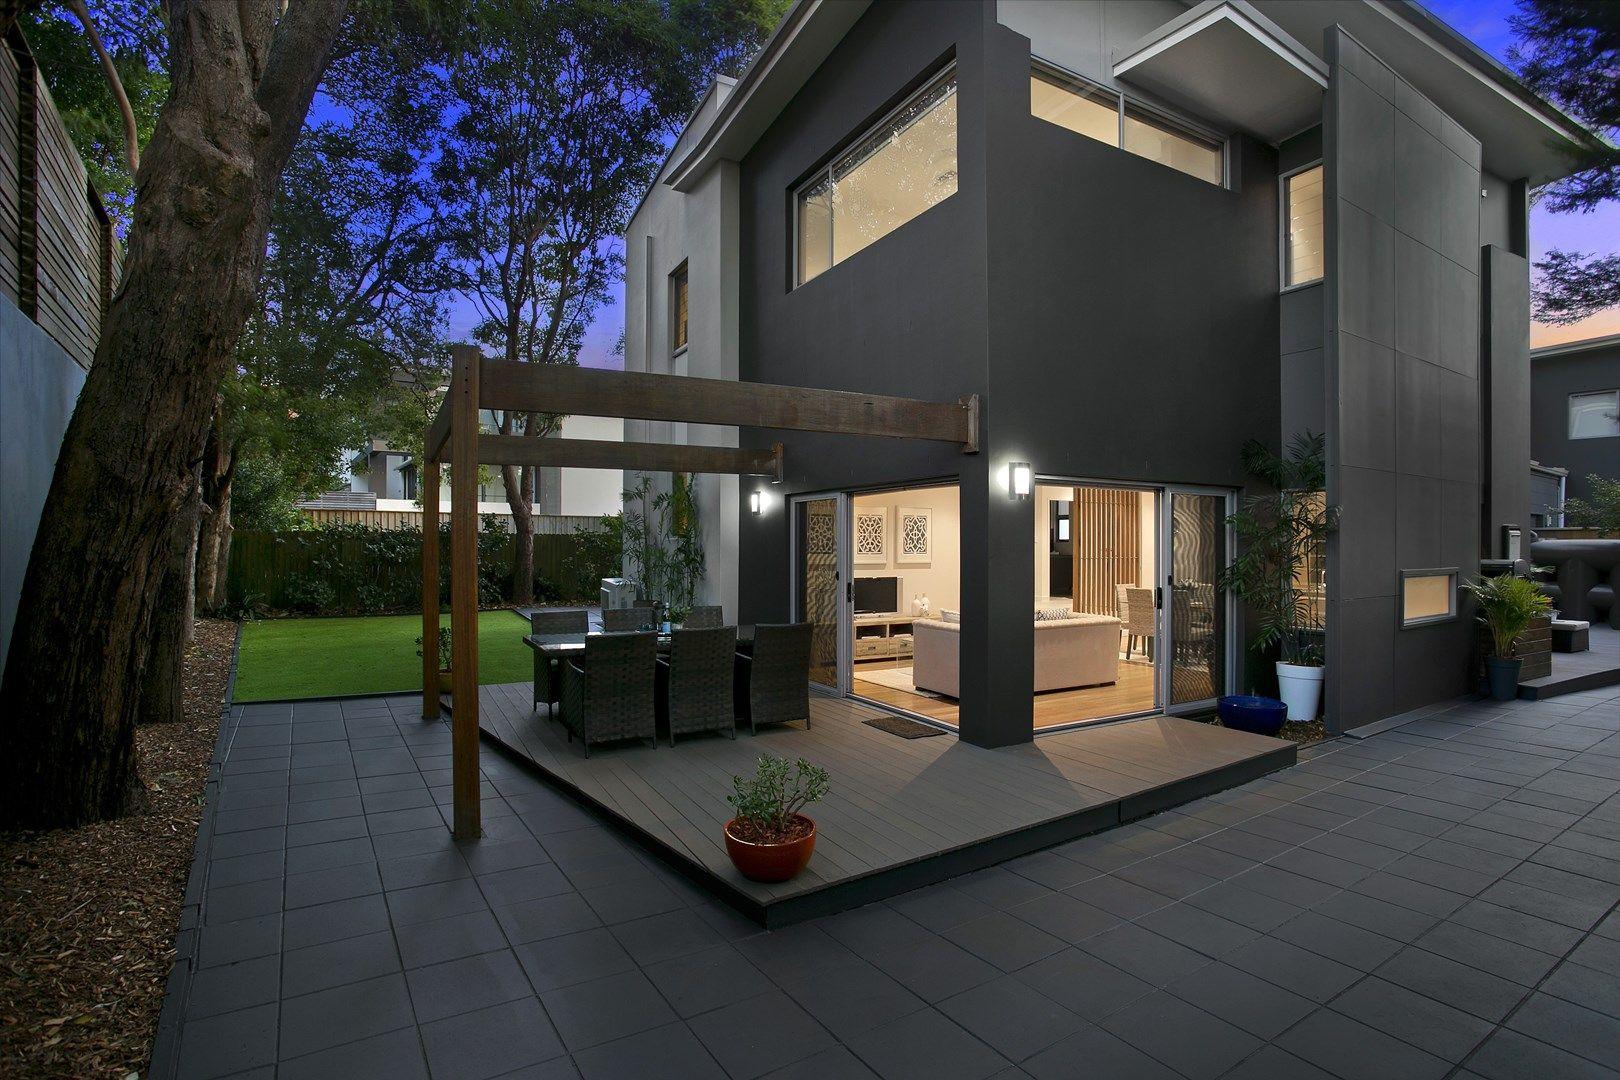 3/186 Woodland Street, Balgowlah NSW 2093, Image 0